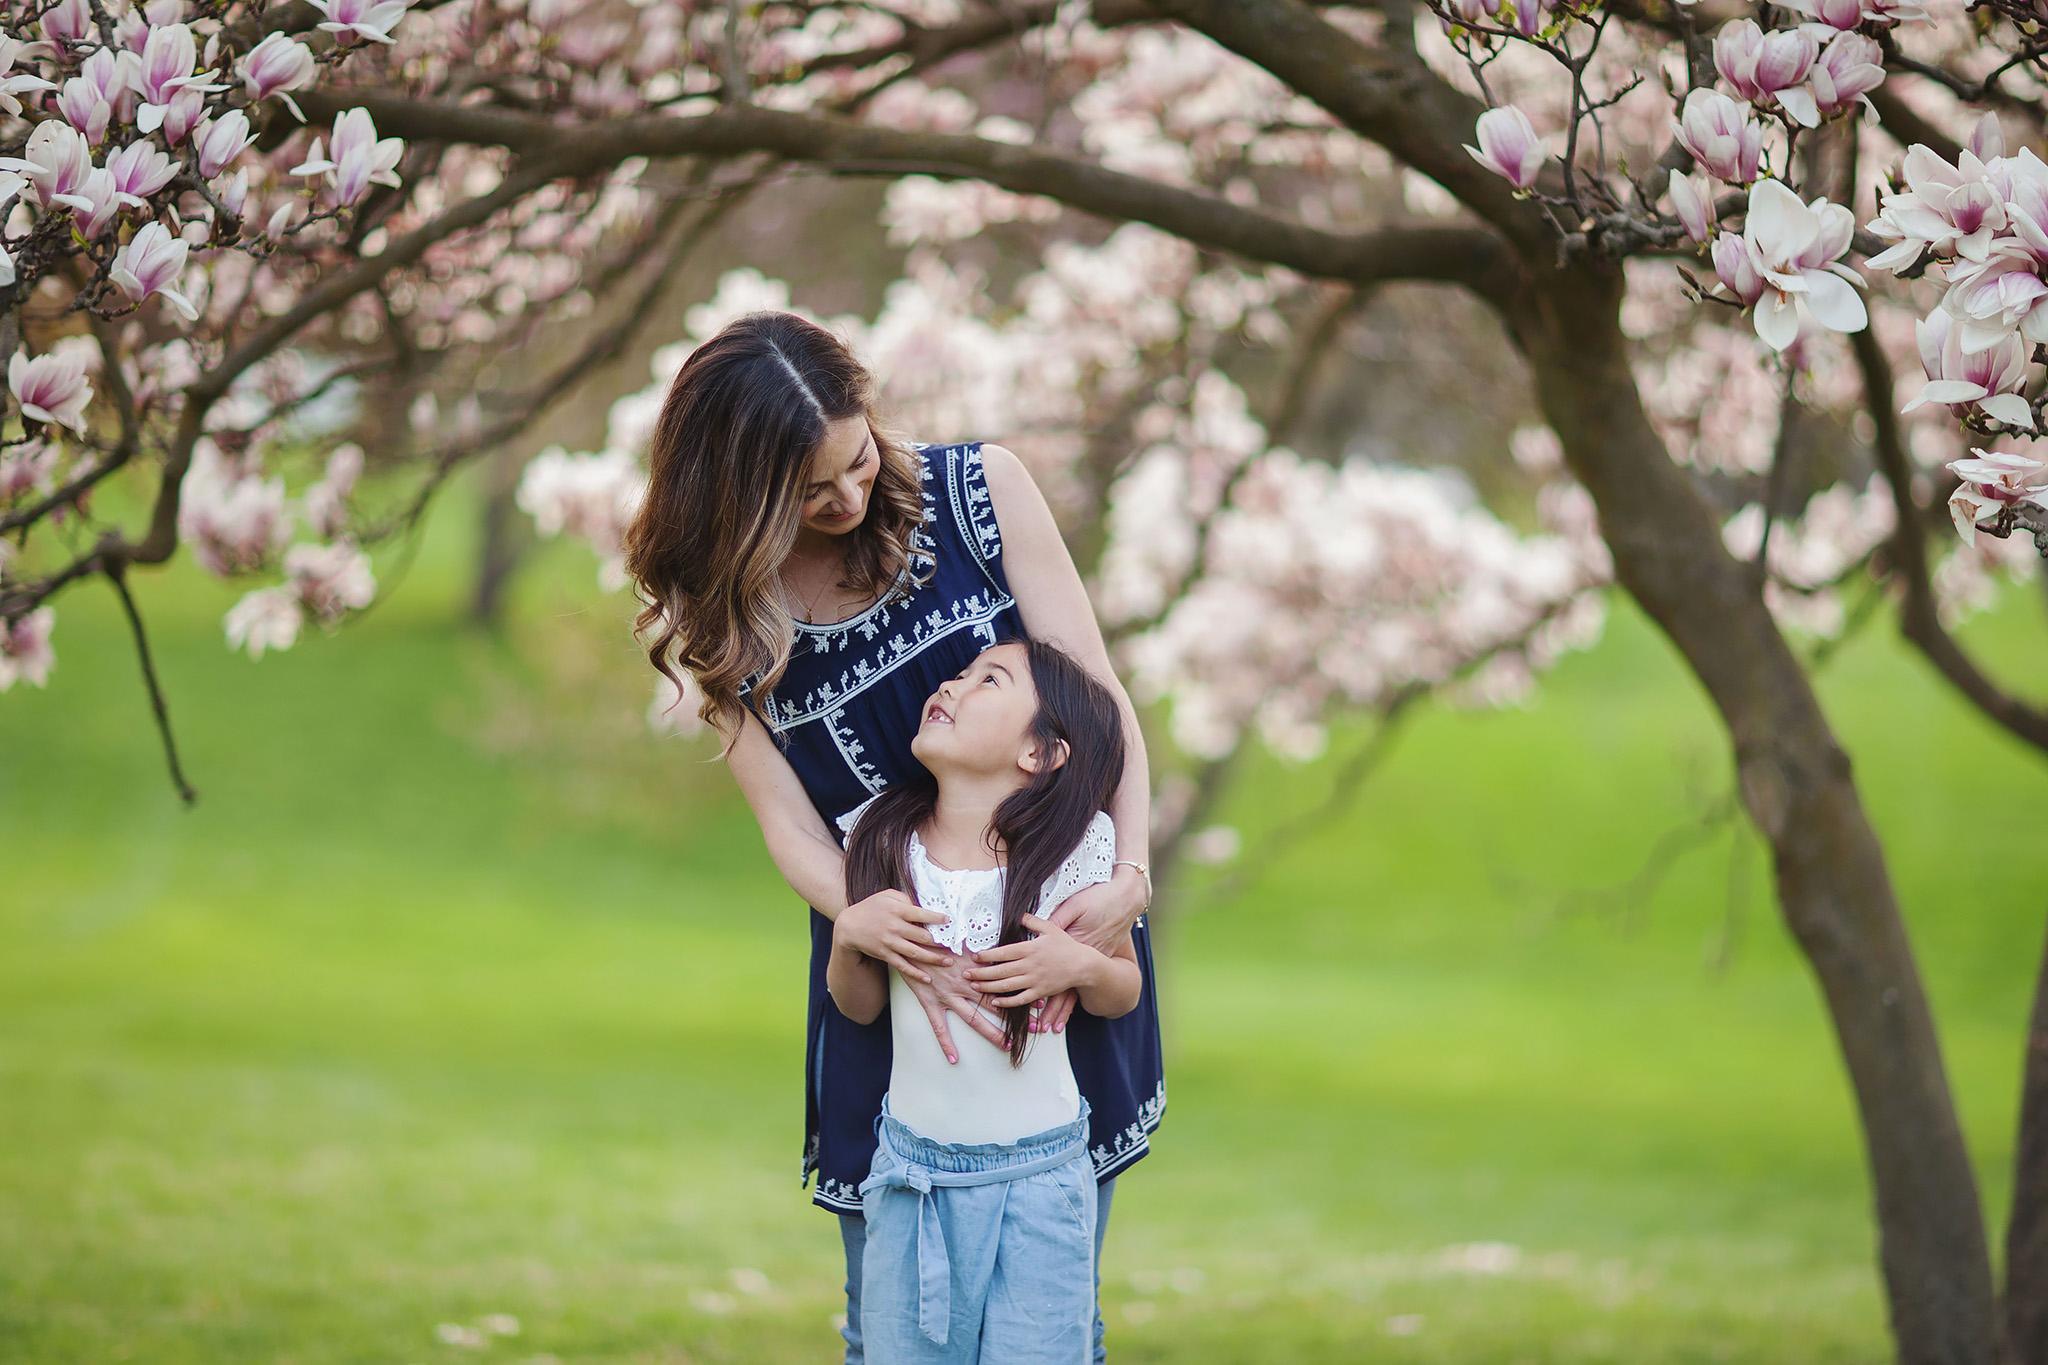 london_ontario_family_photographer-raw_footage_photography-spring_blossom_mini_sessions-magnolia-springbank_park008.jpg